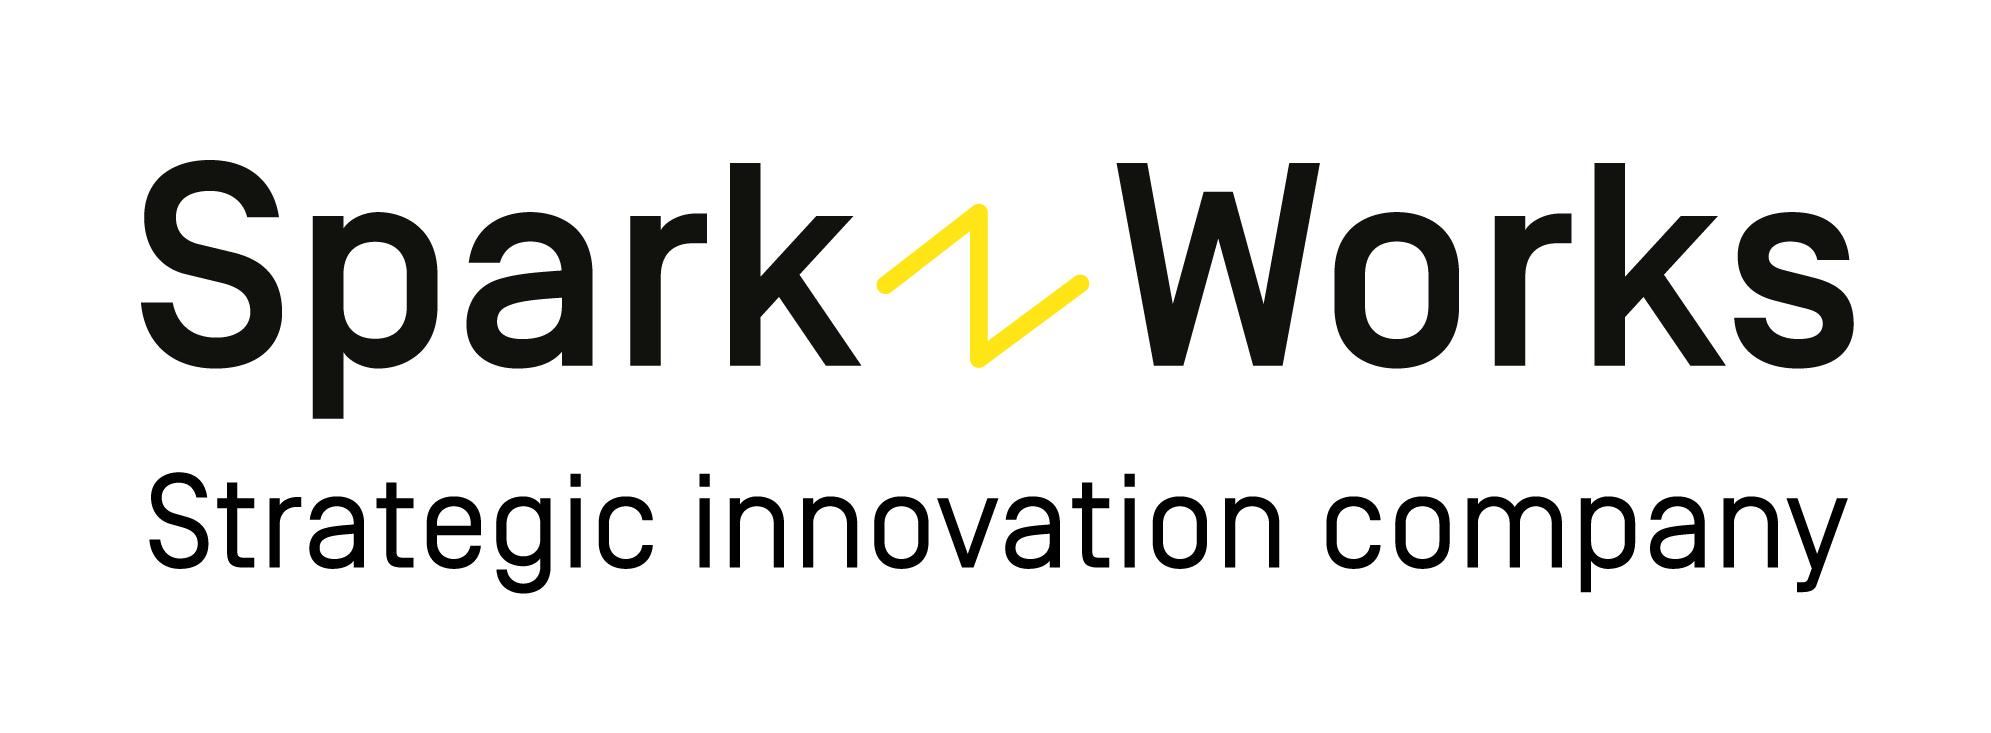 Spark Works's logo